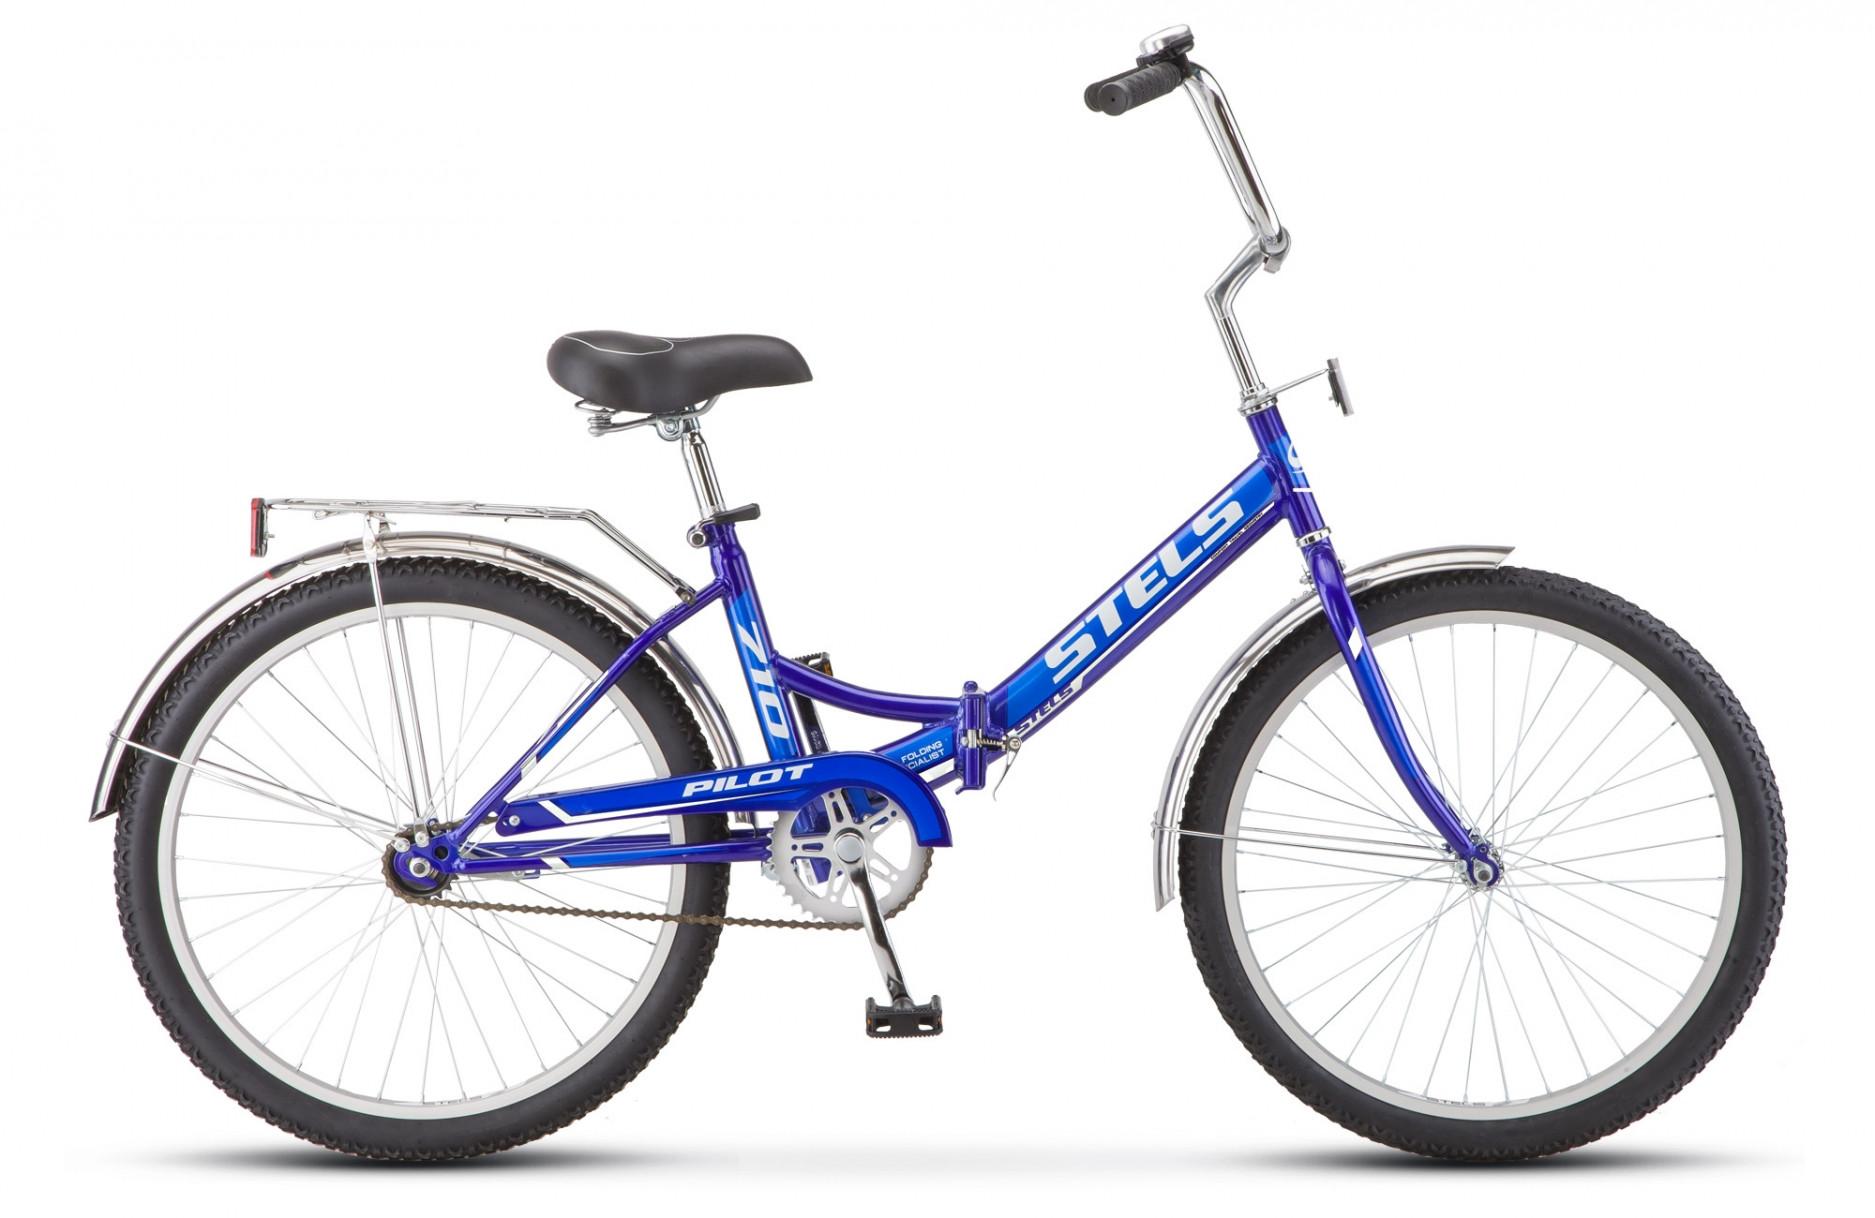 Складной велосипед Stels Pilot-710 2018 Z010 синий